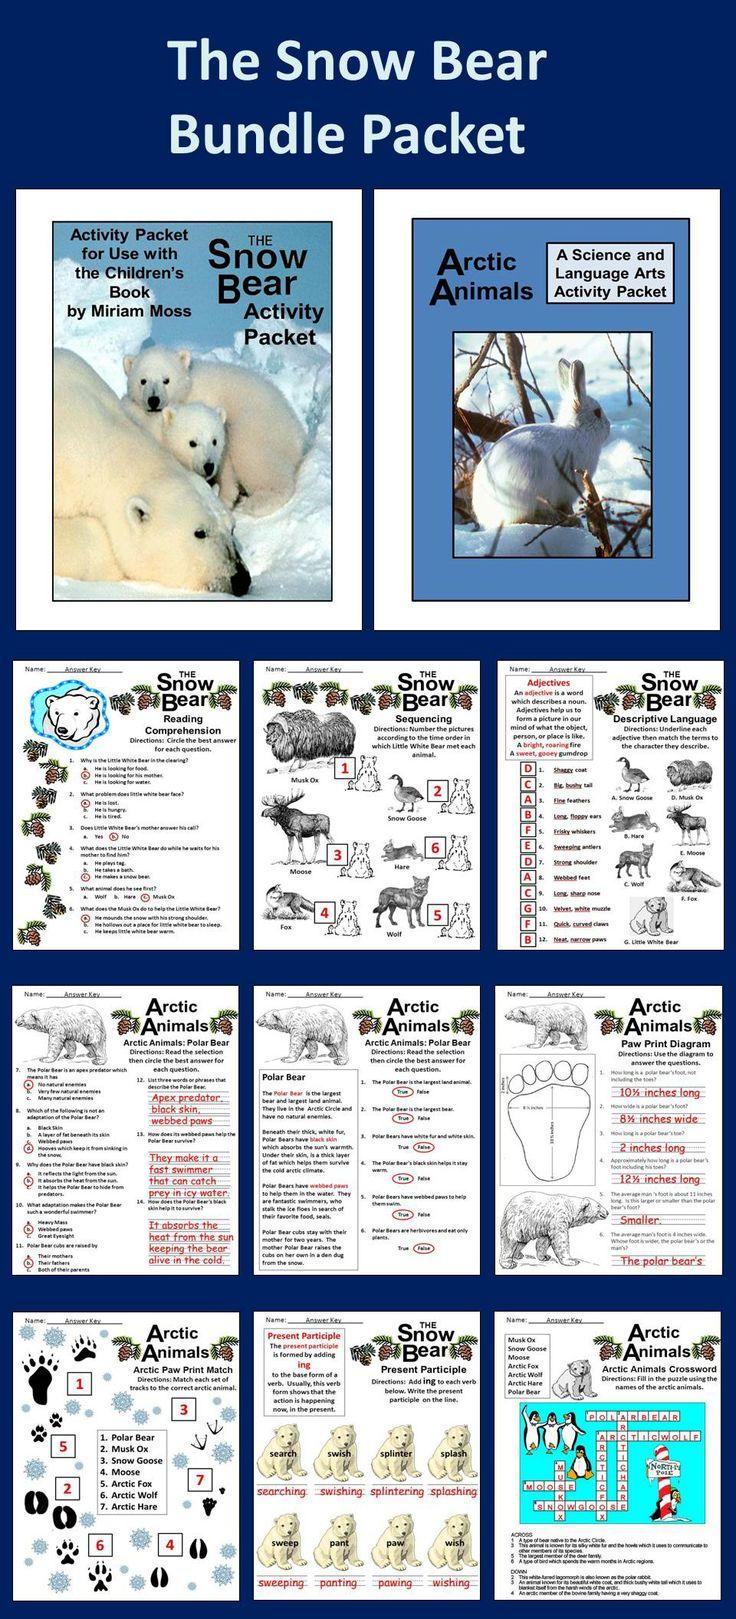 ... polar bear's print * Paw prints Sheet * Crossword * Seven Reading